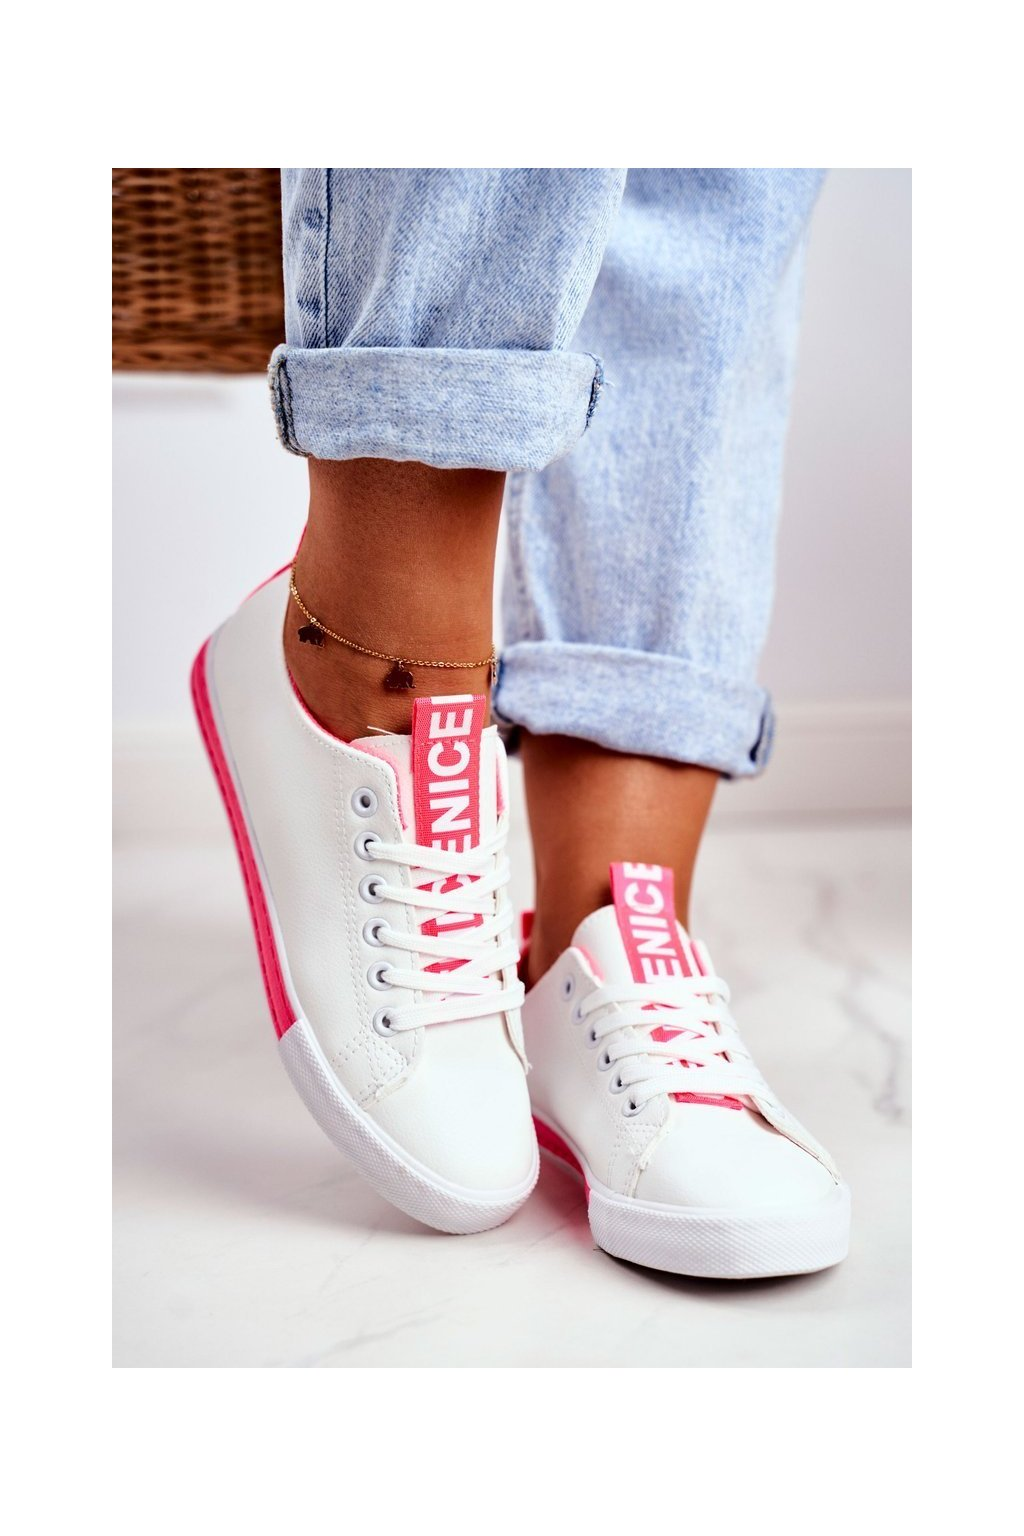 Ružová obuv NJSK LA70 FUCHSIA